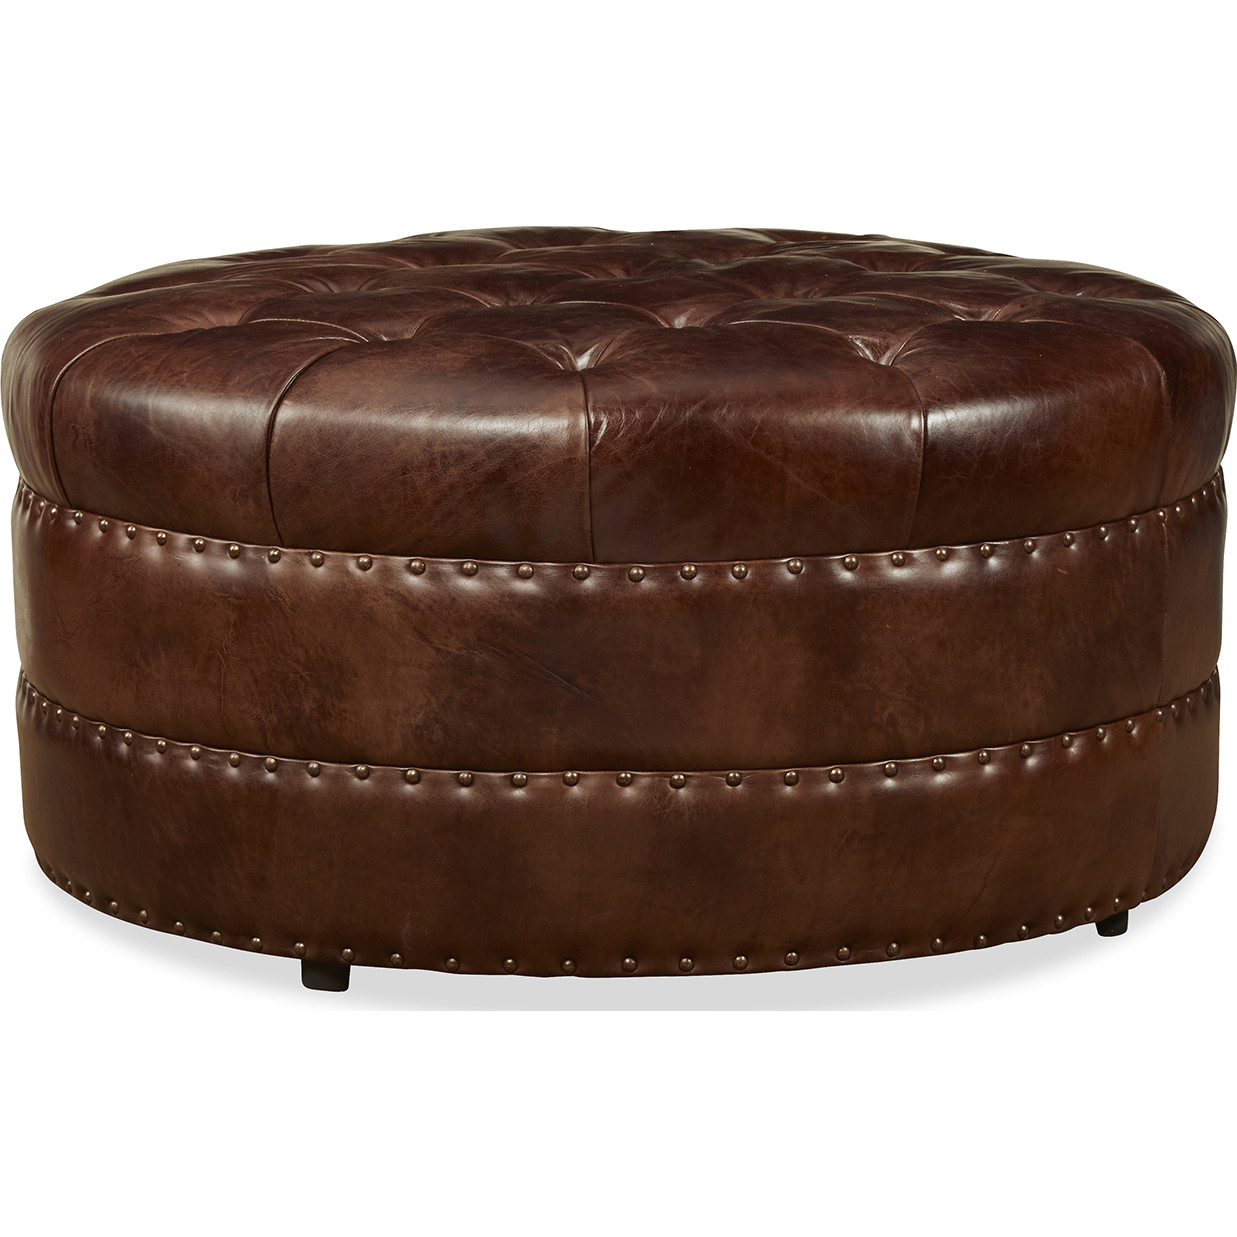 Wondrous Spectra Hudson Cocktail Ottoman Tufted Chocolate Brown Top Theyellowbook Wood Chair Design Ideas Theyellowbookinfo